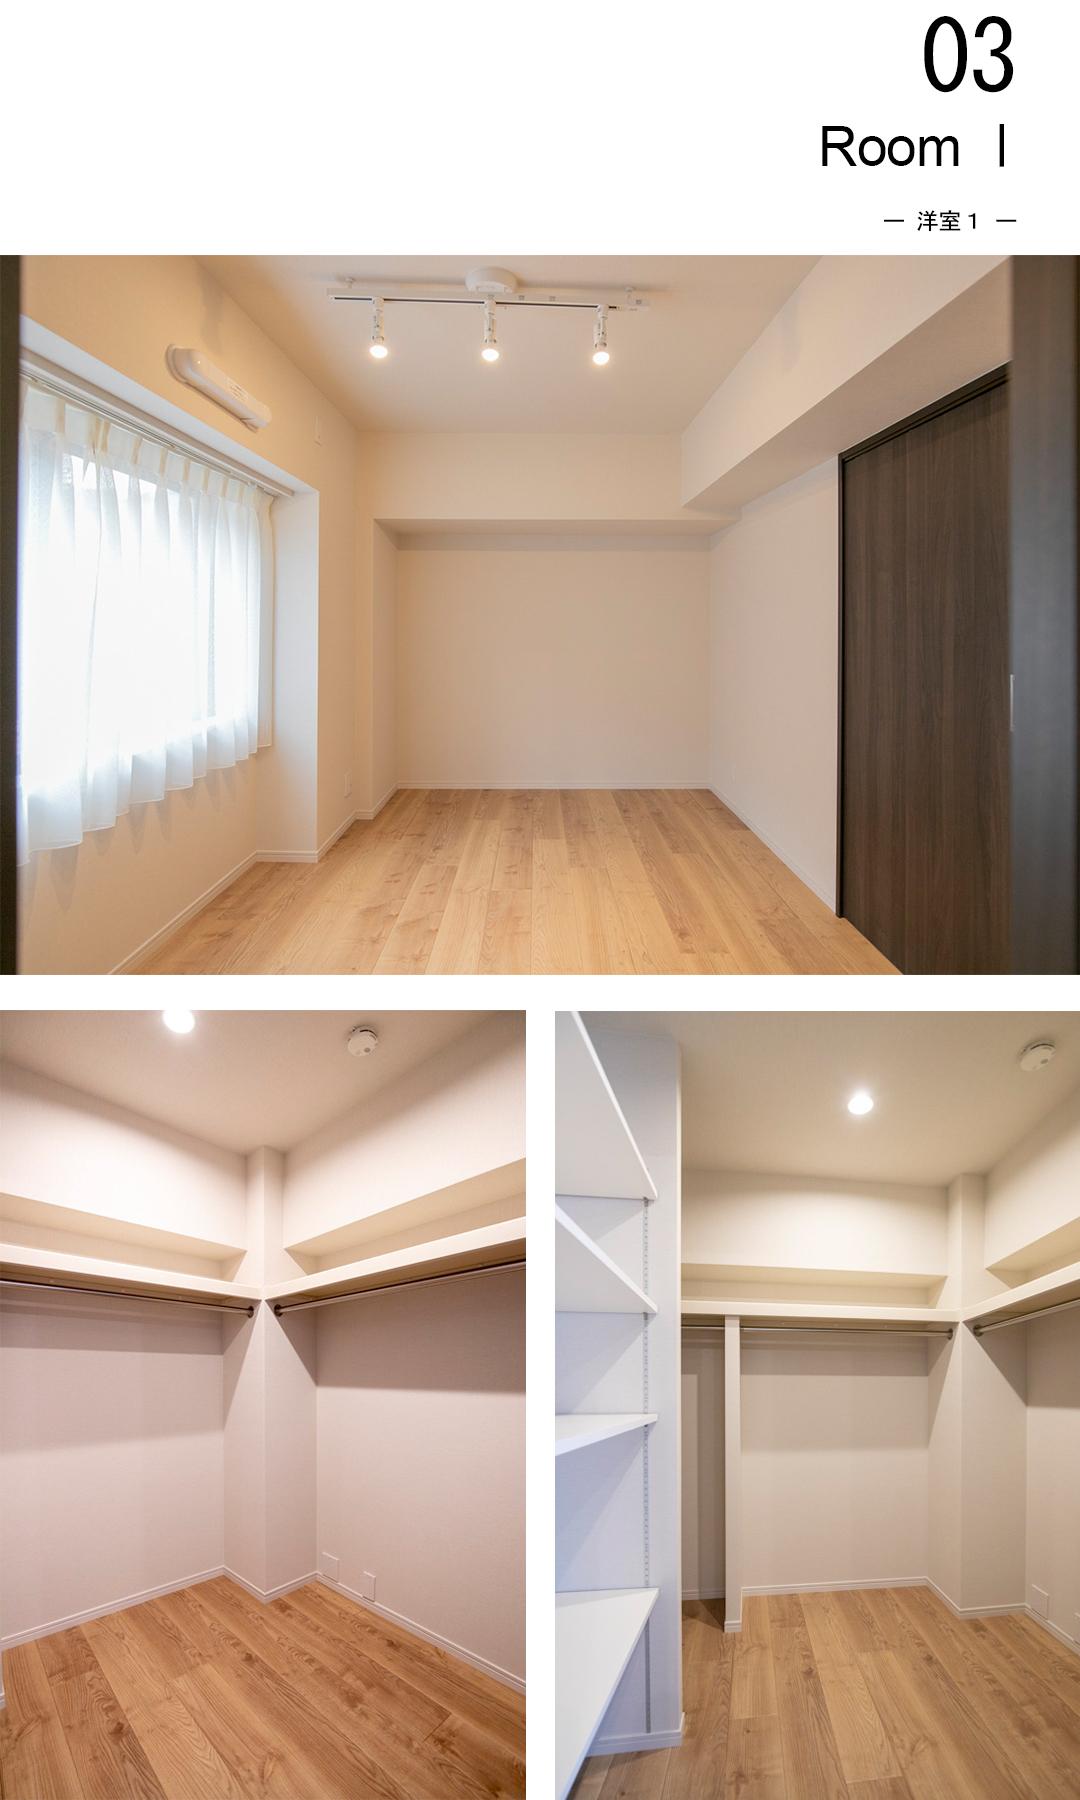 03,room1,洋室1